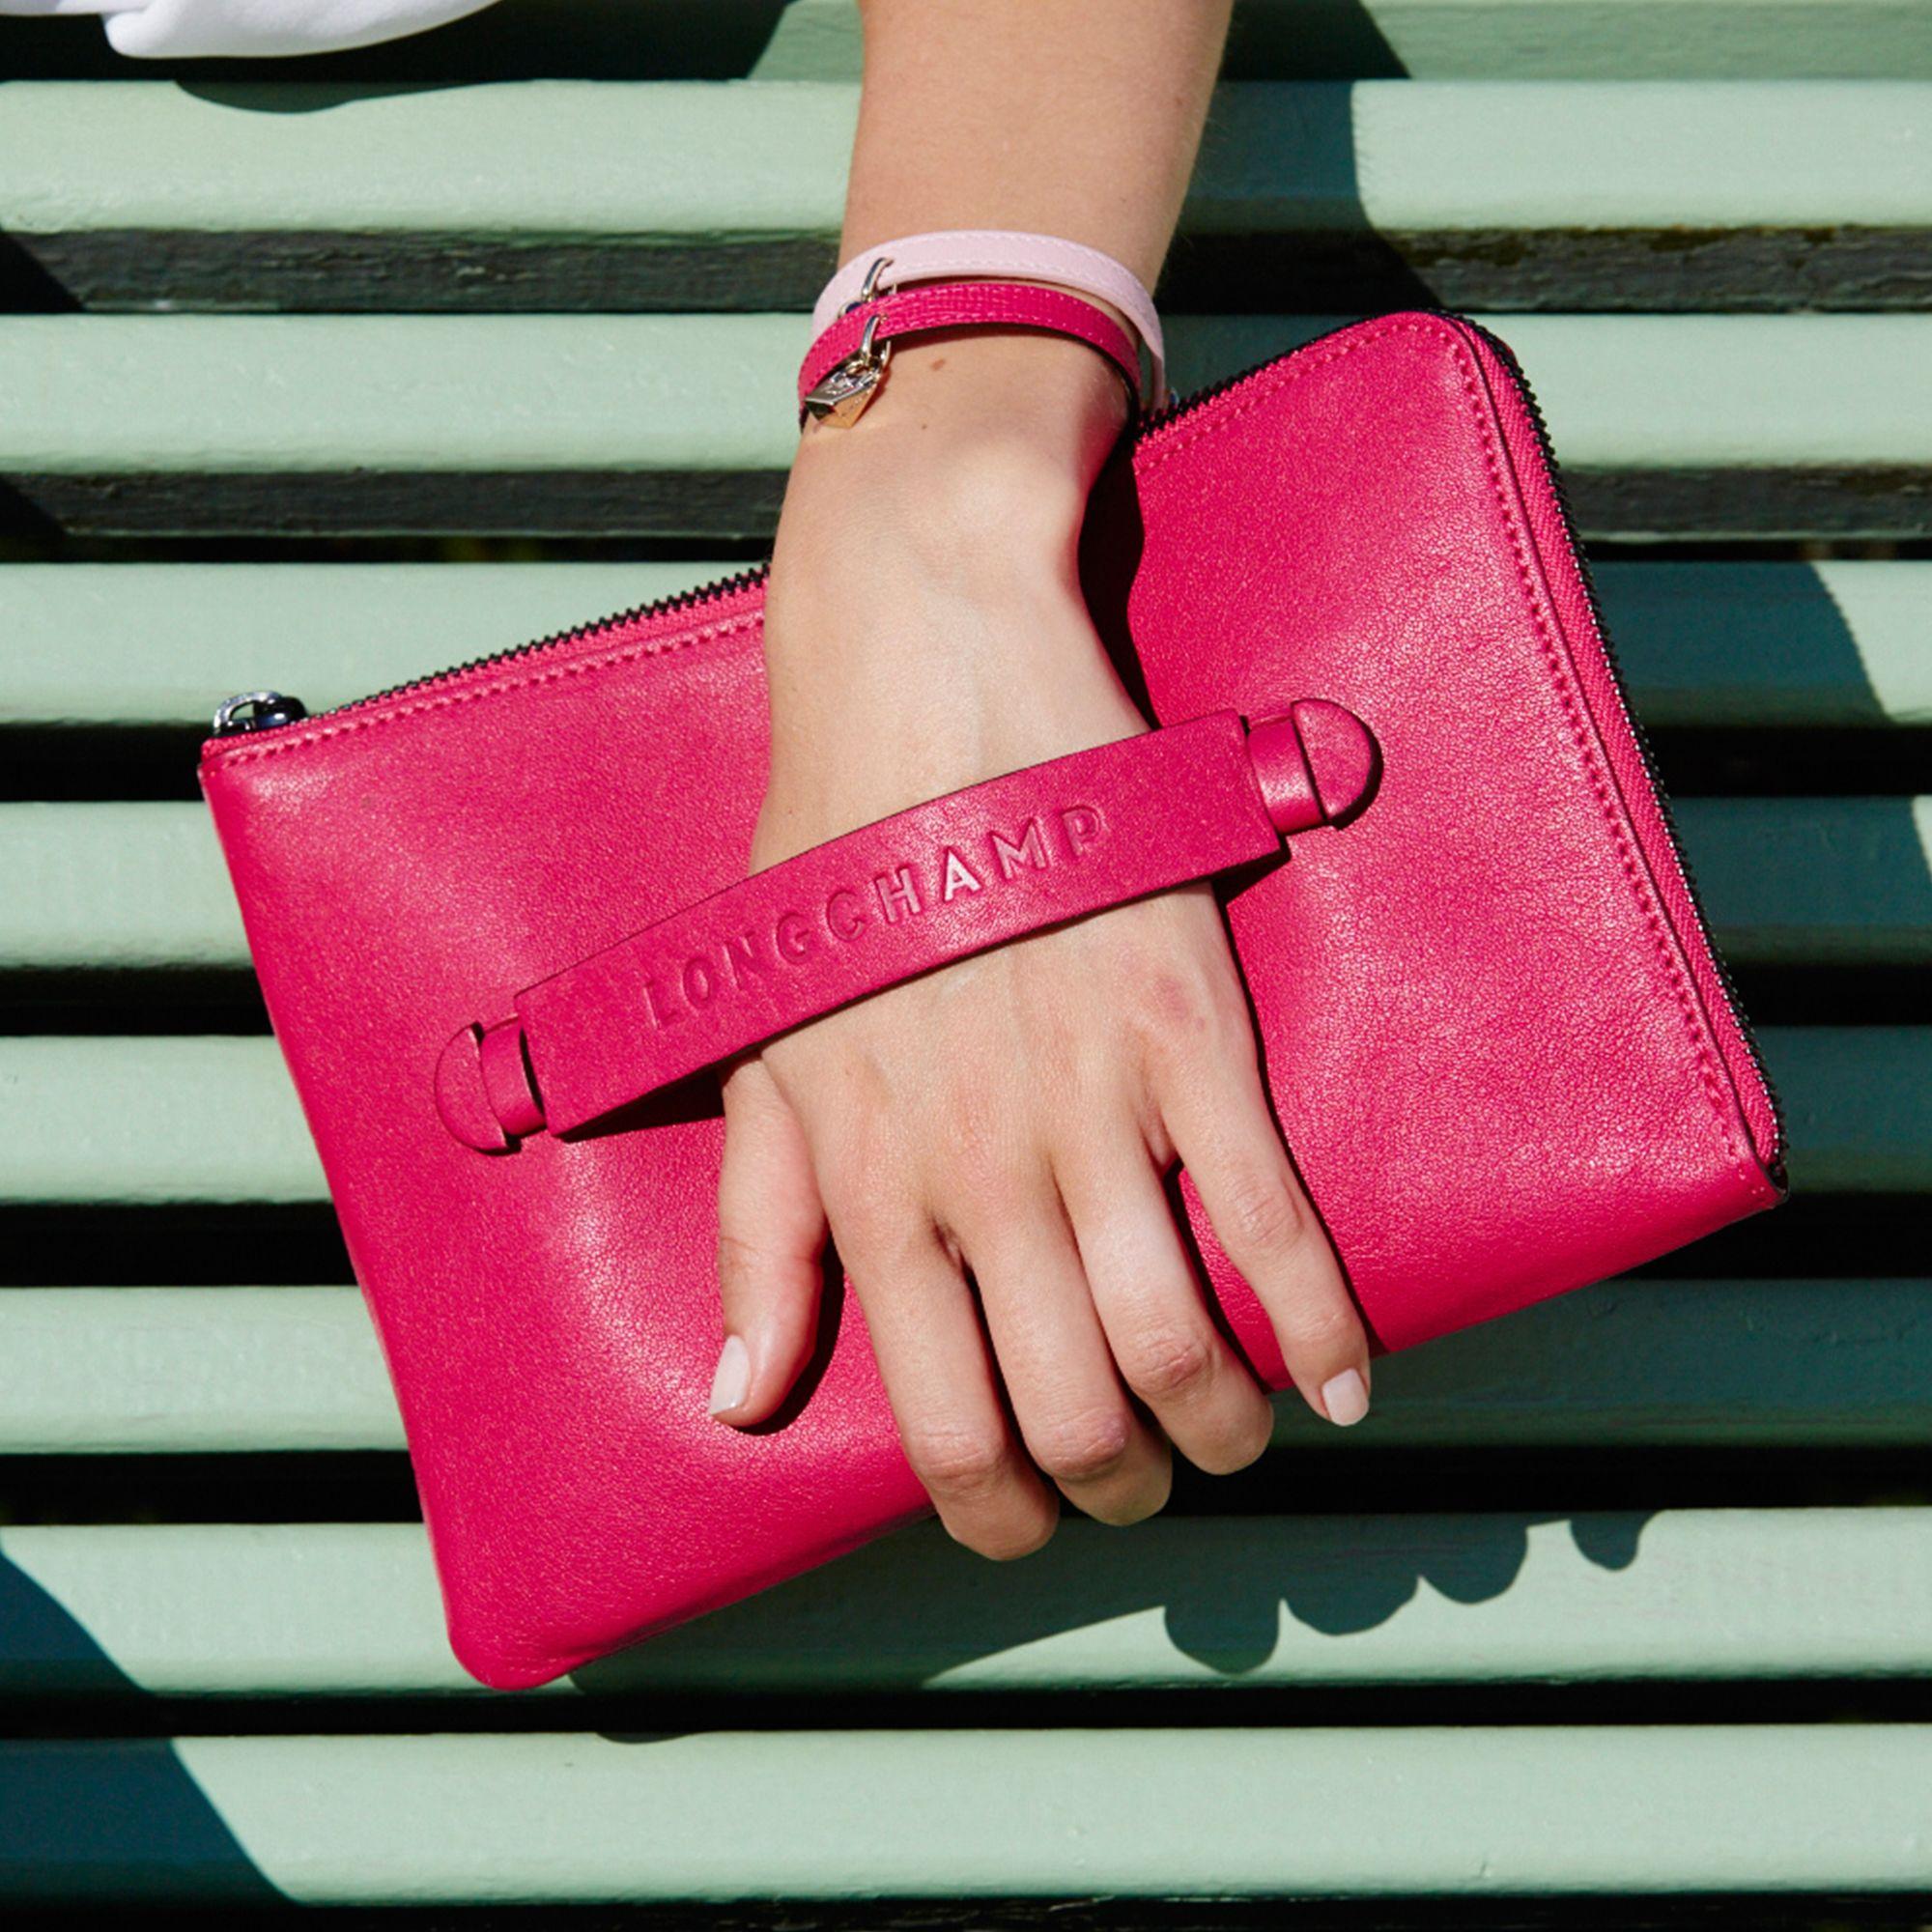 Epingle Sur Longchamp Small Leather Goods